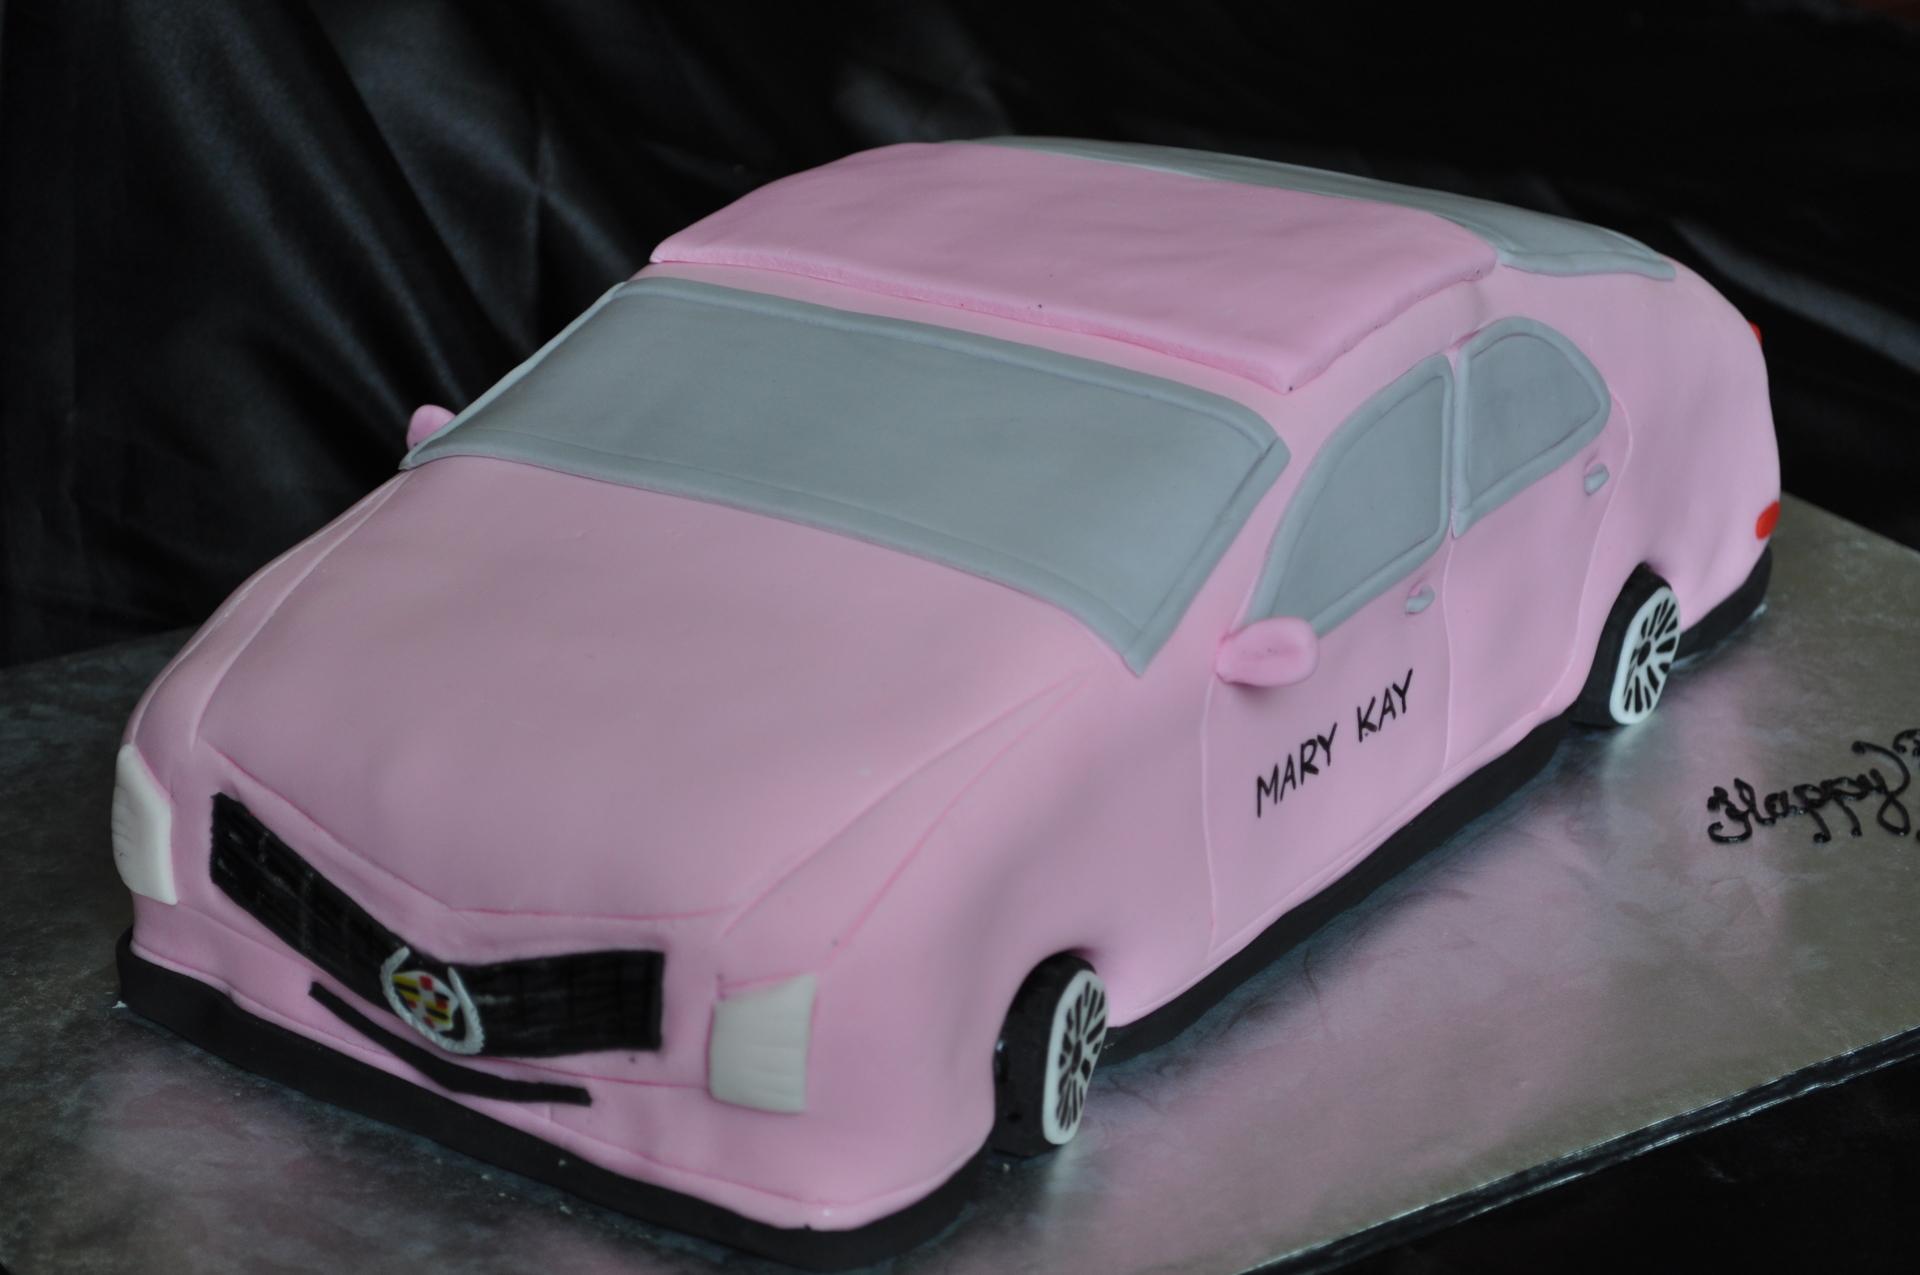 Pink cadillac cake